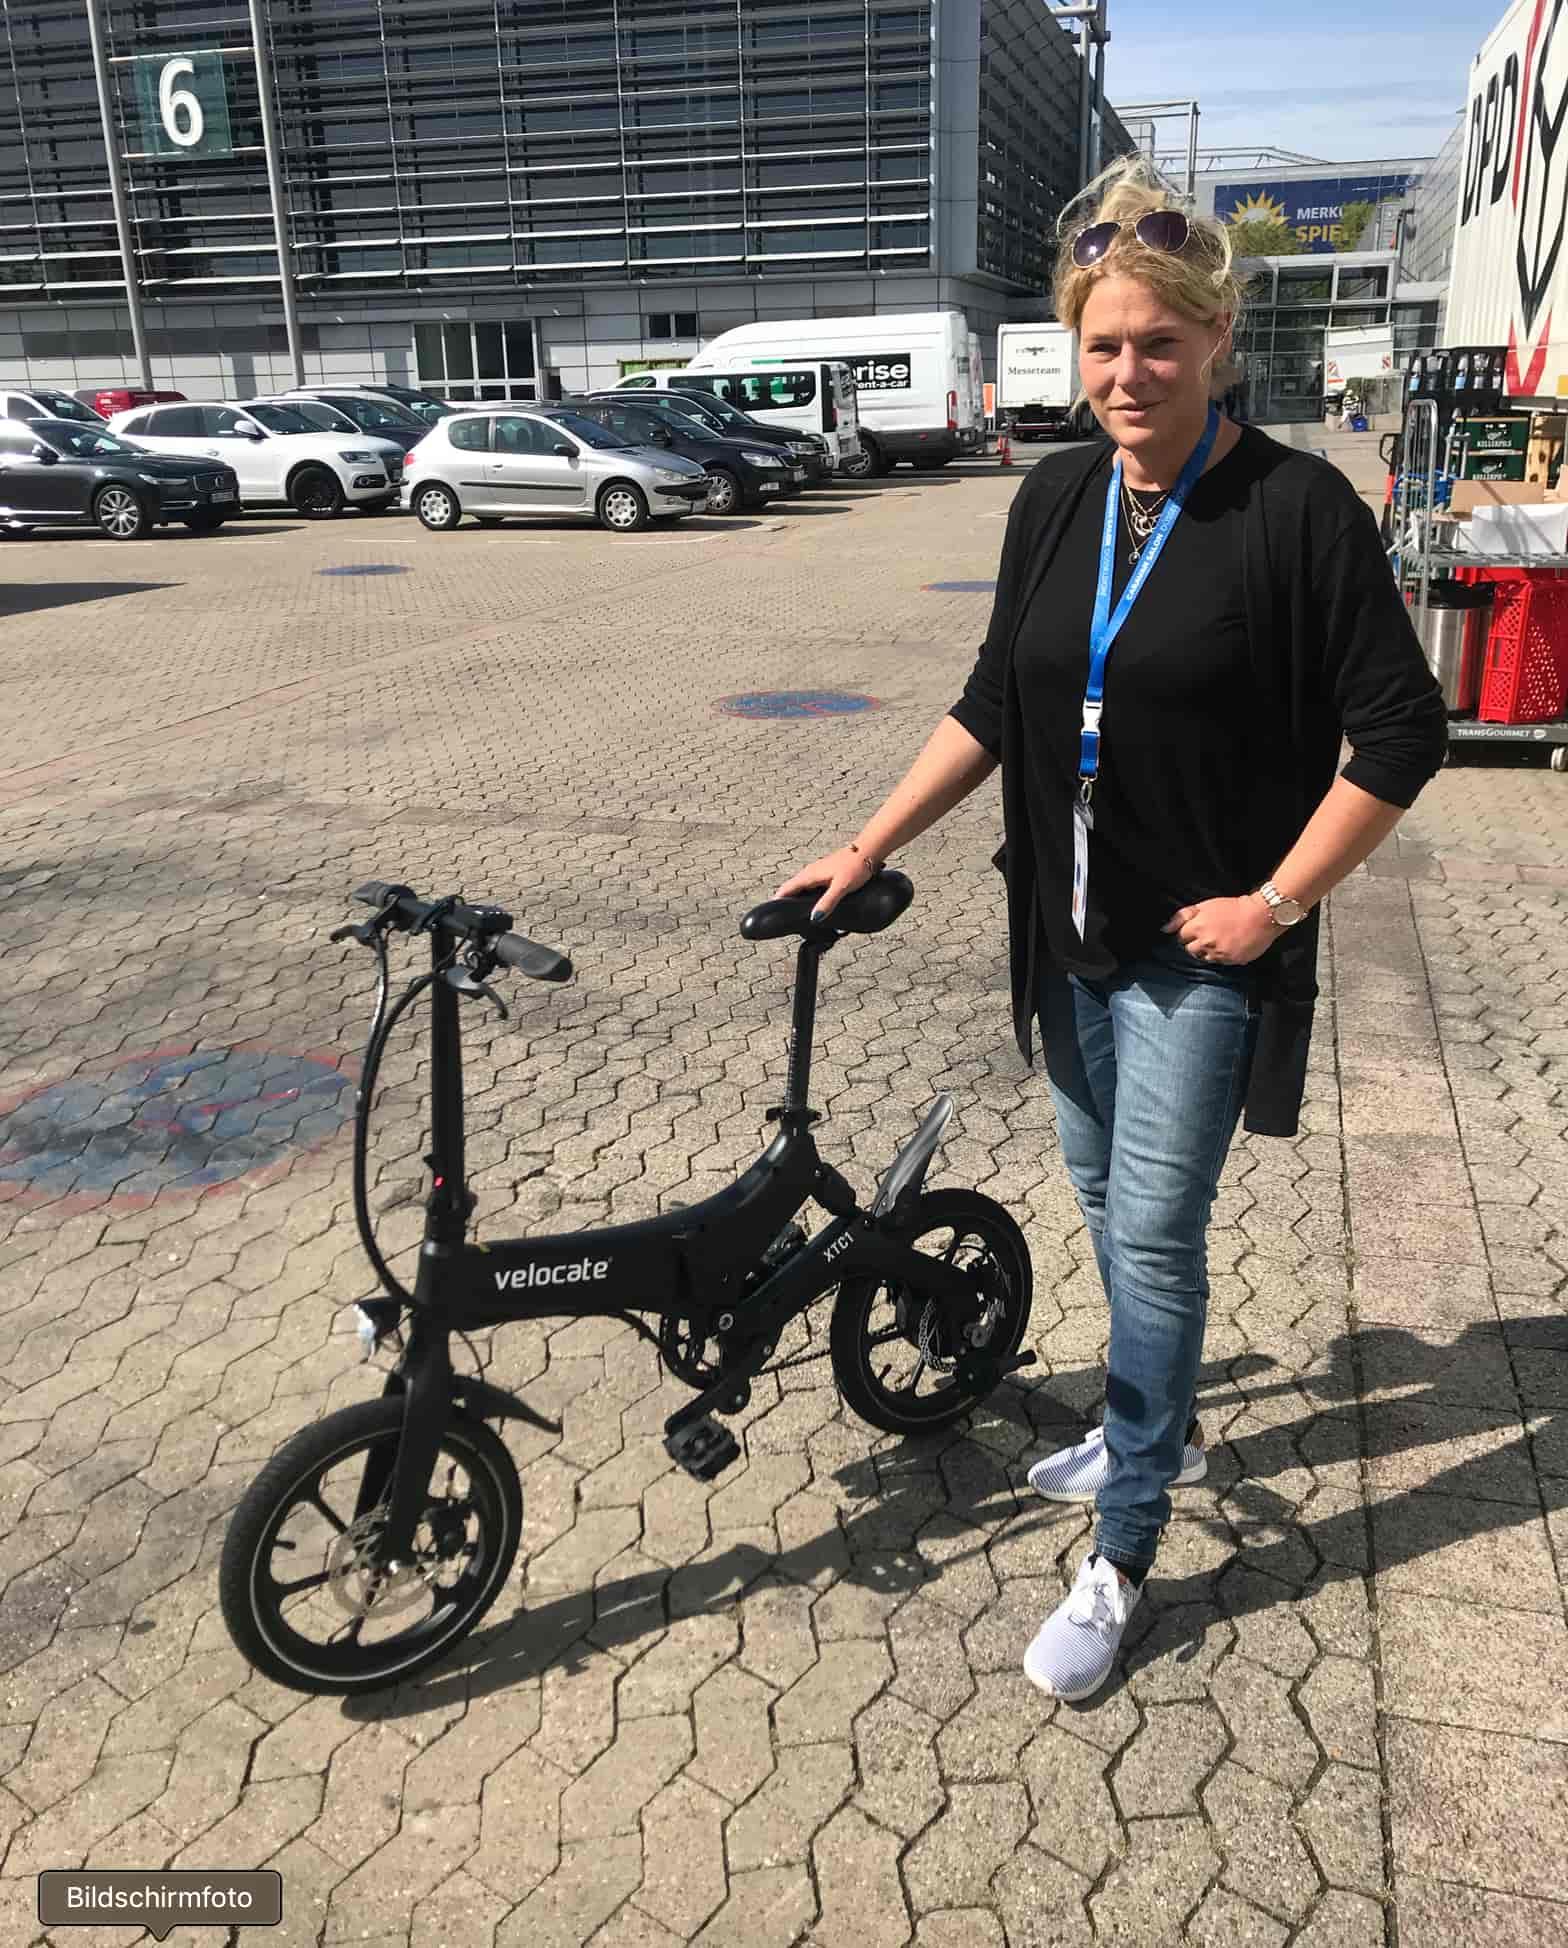 Klapp E-Bike von Velocate